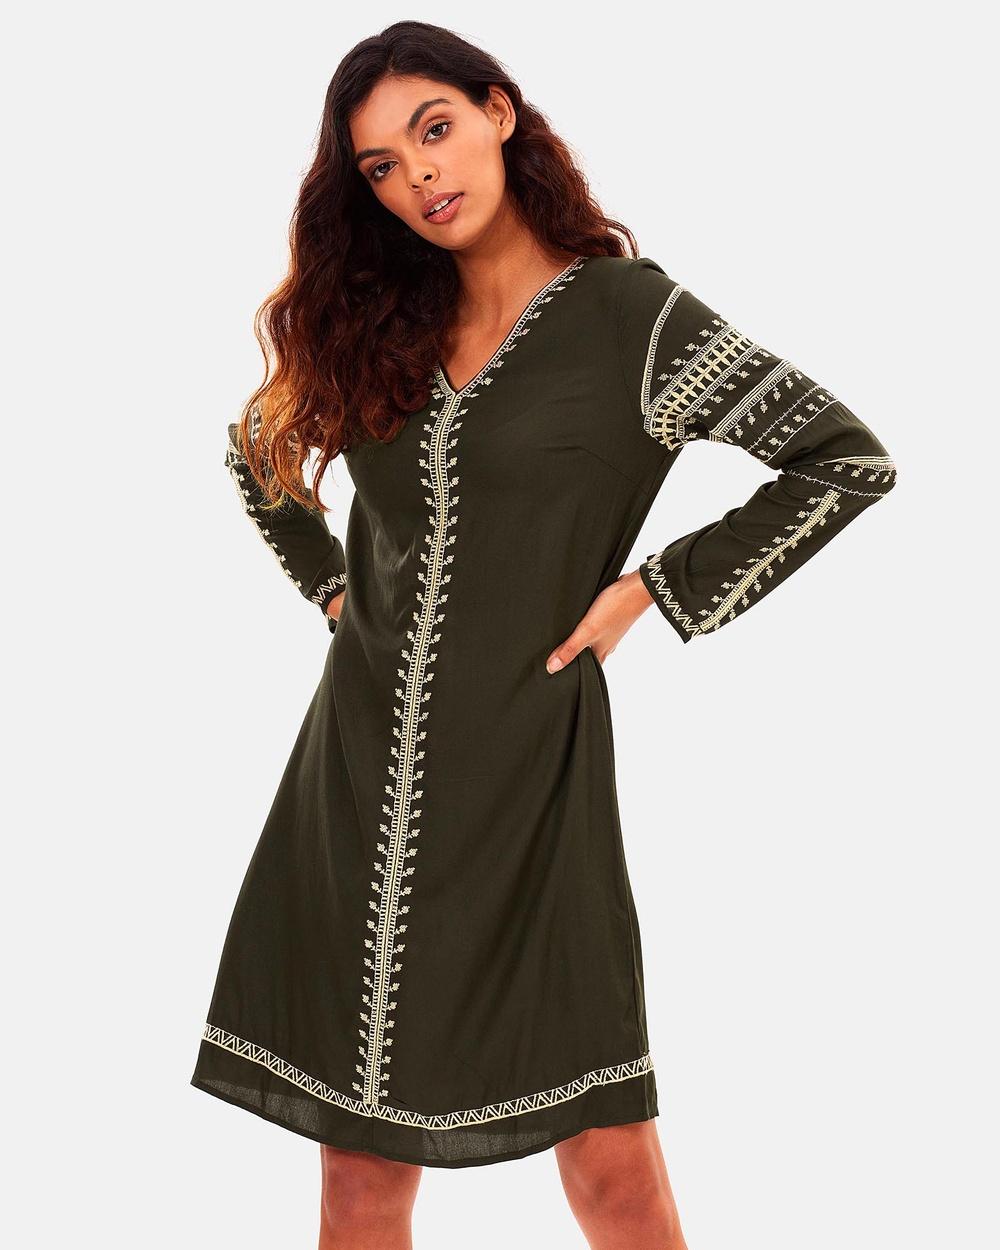 Kaja Clothing Sage Dress Dresses Green Sage Dress